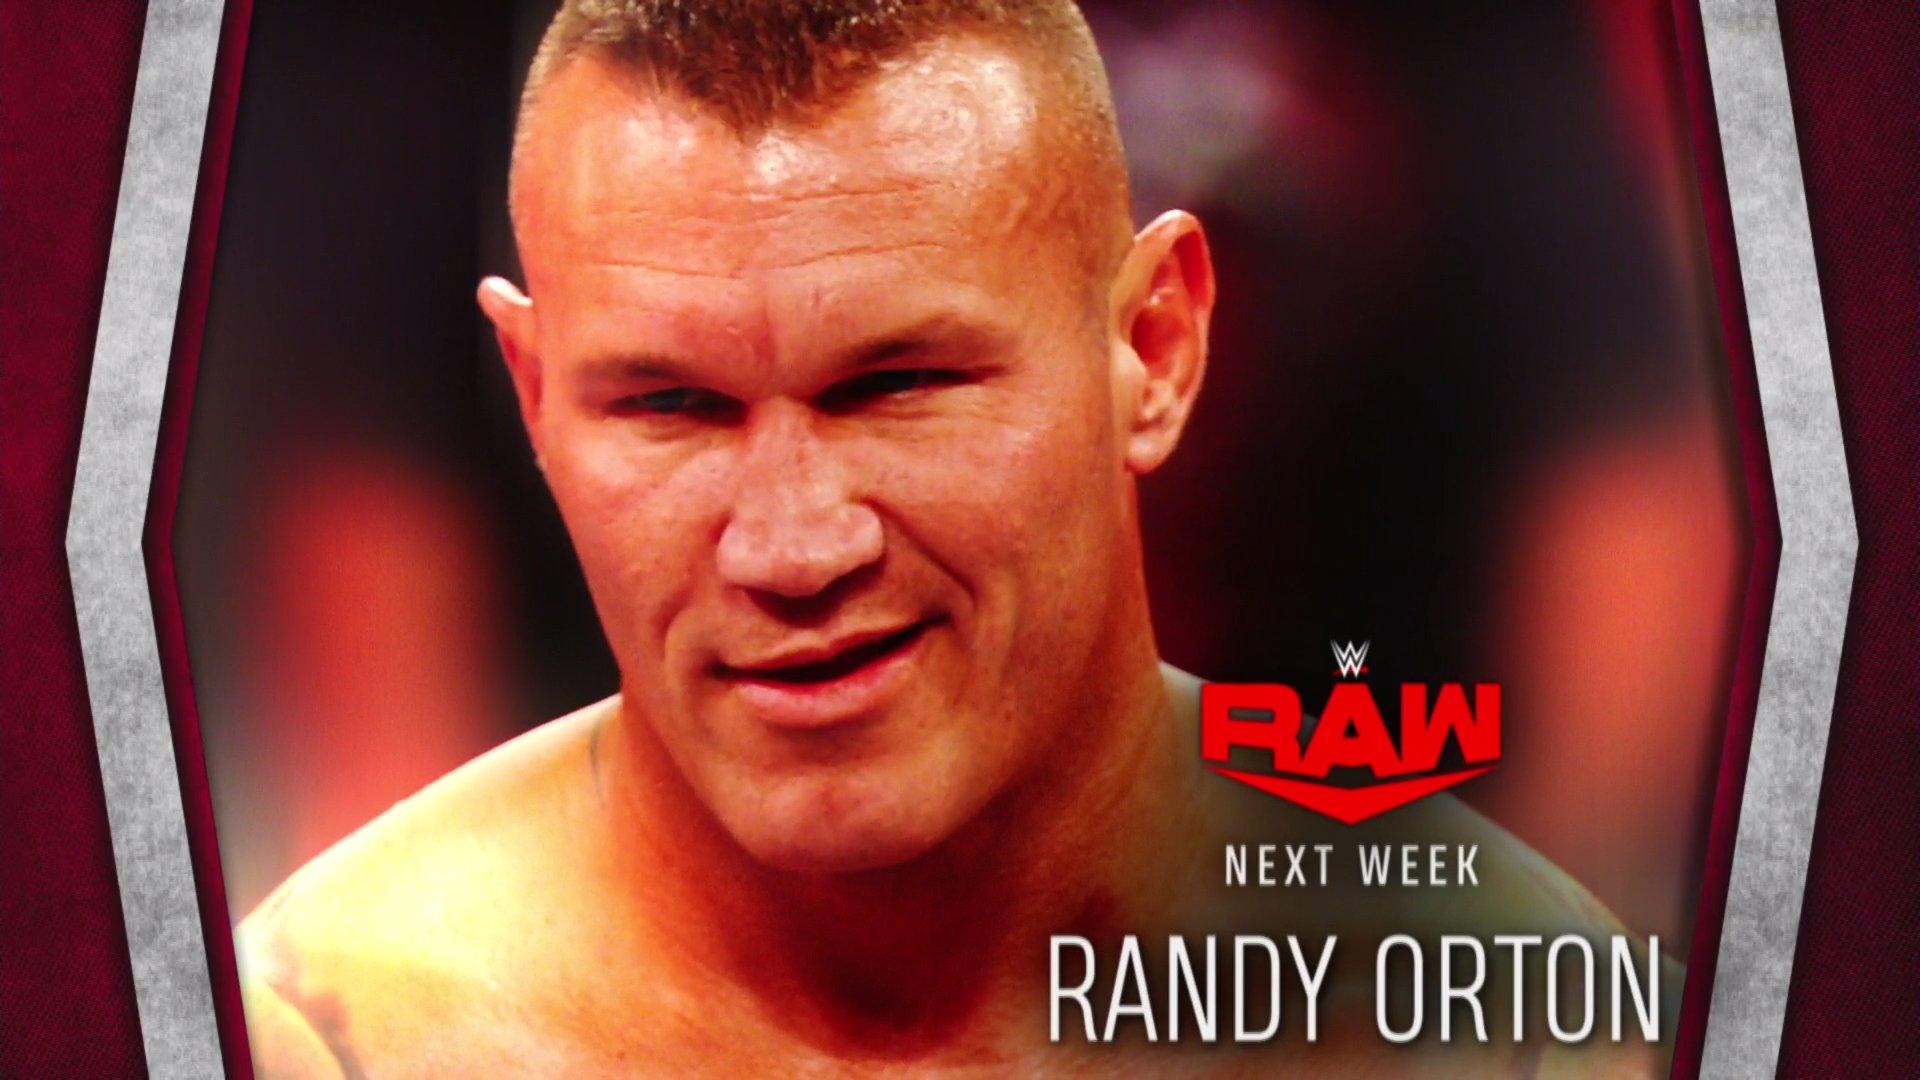 WWE Raw Preview (23/03/20): Brock Lesnar Returns; Randy Orton Responds To Edge 3